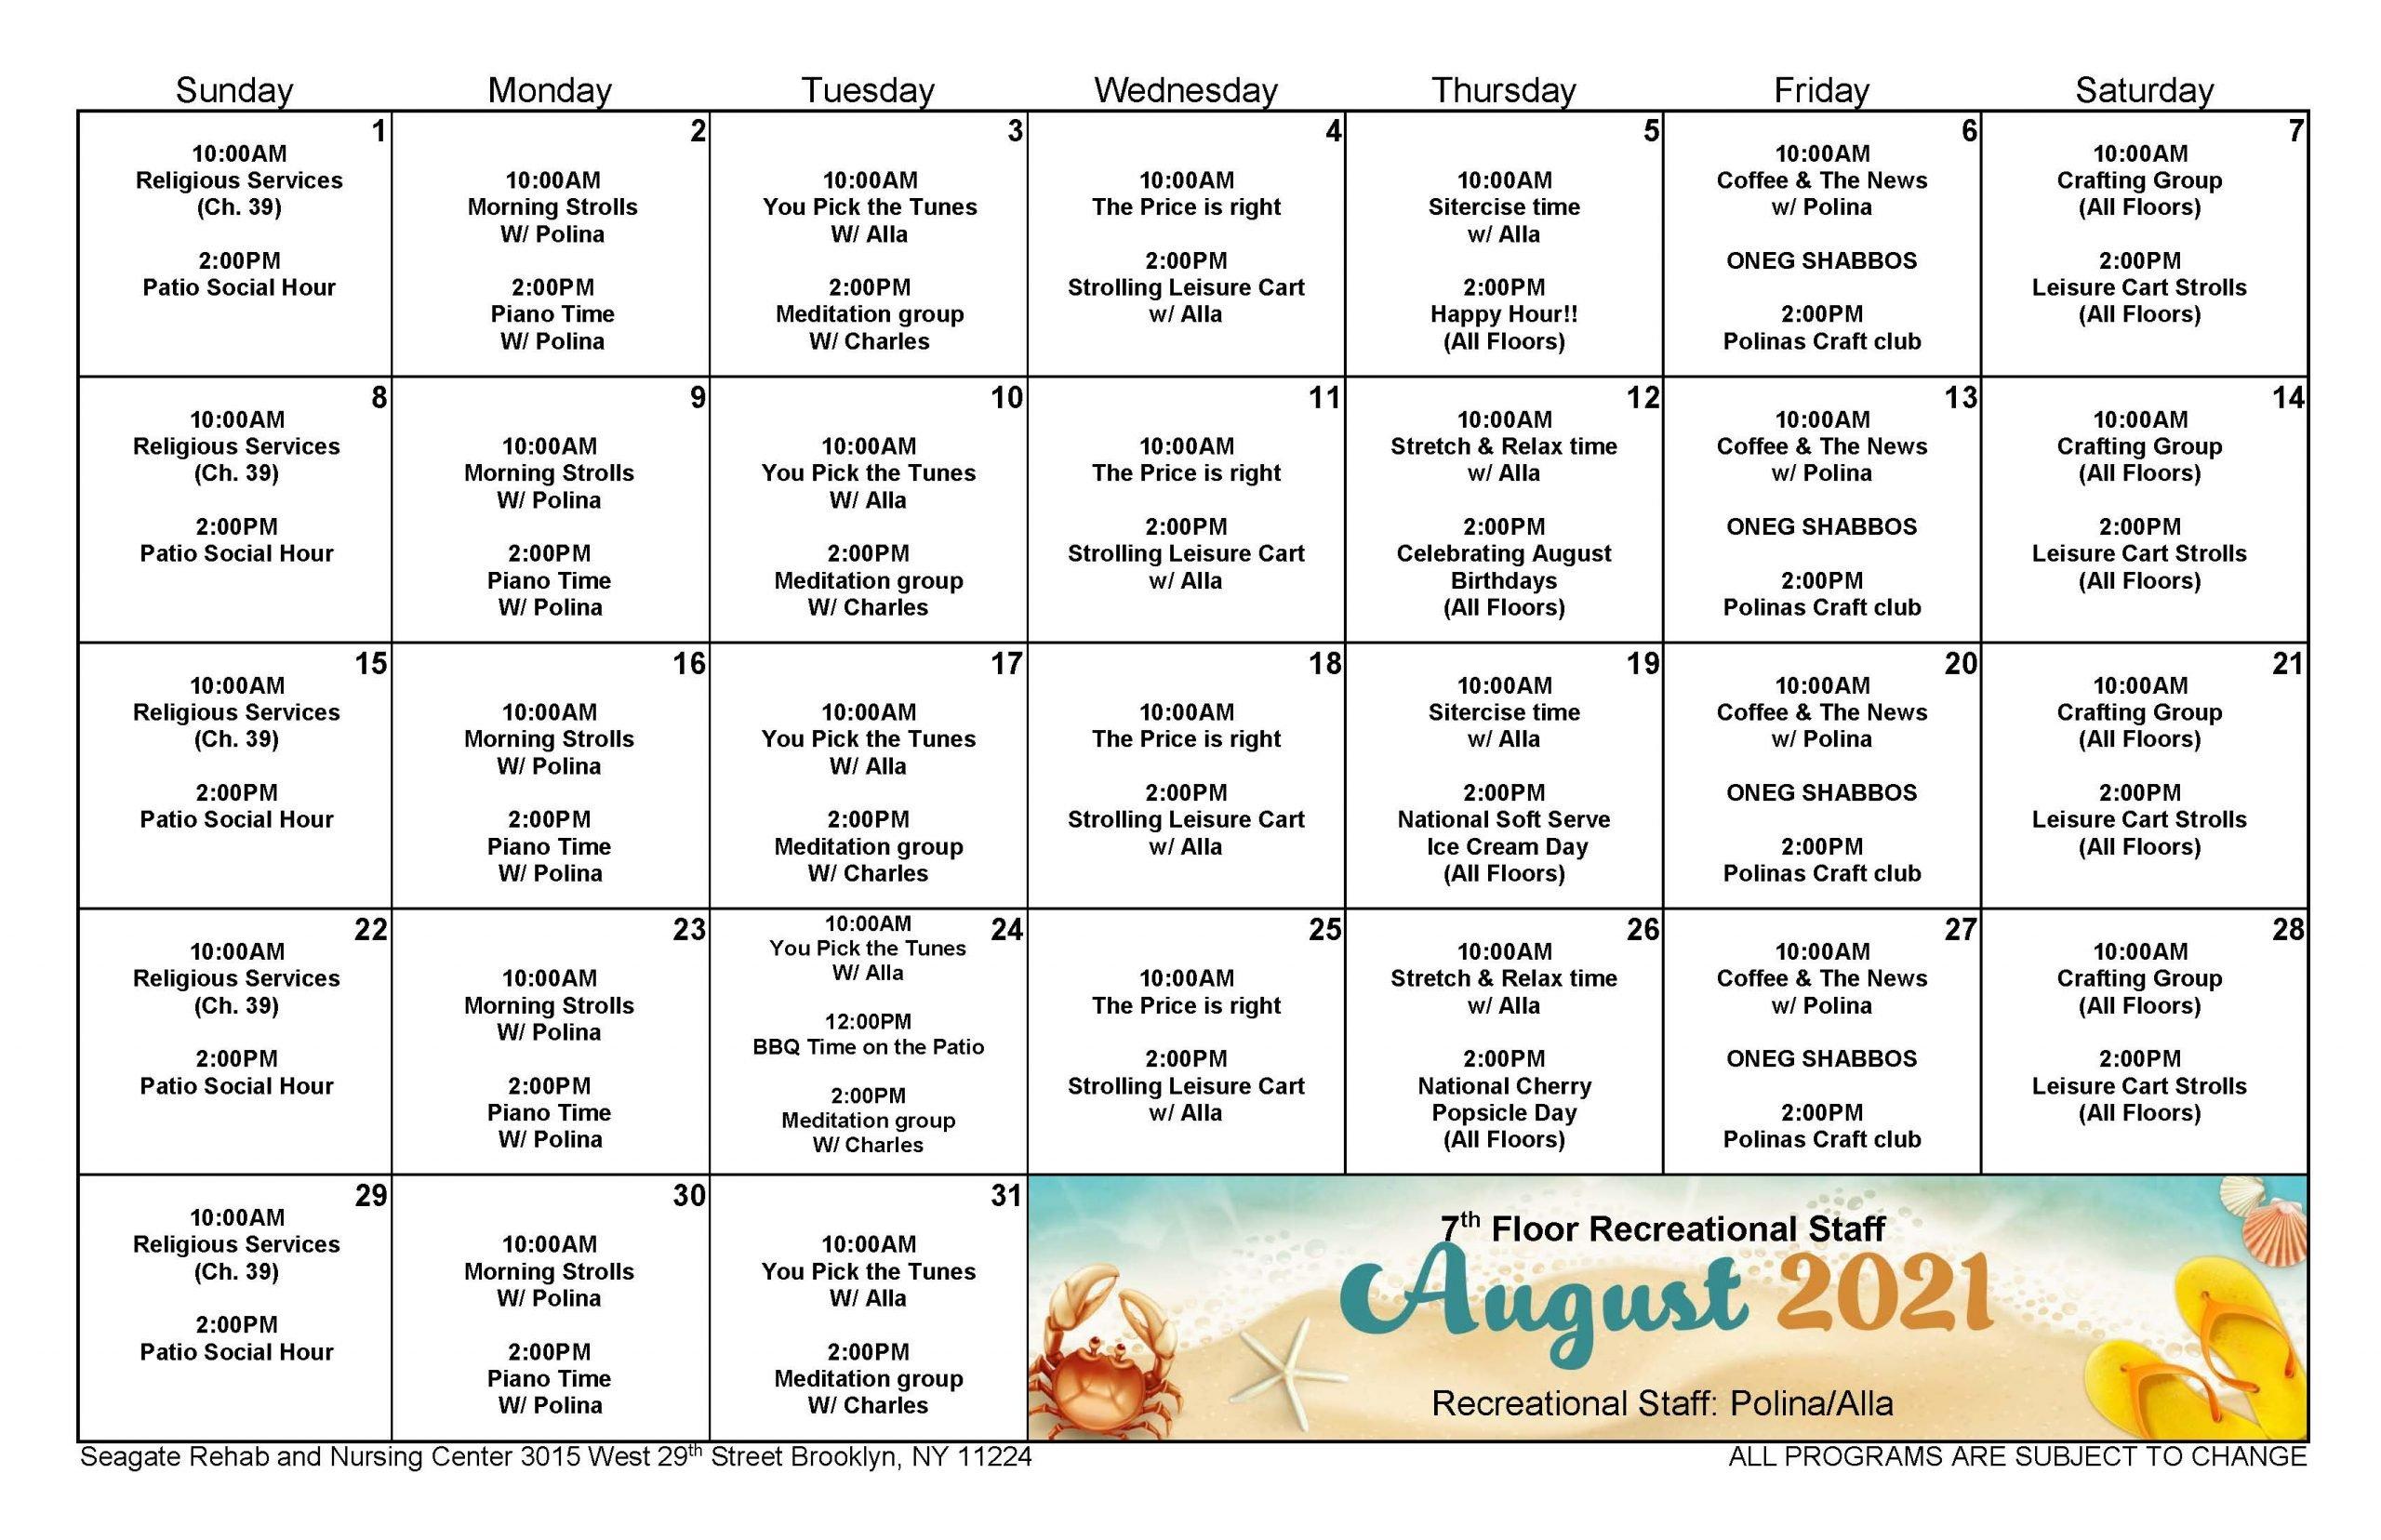 Seagate August Event Calendar for 7th Floor